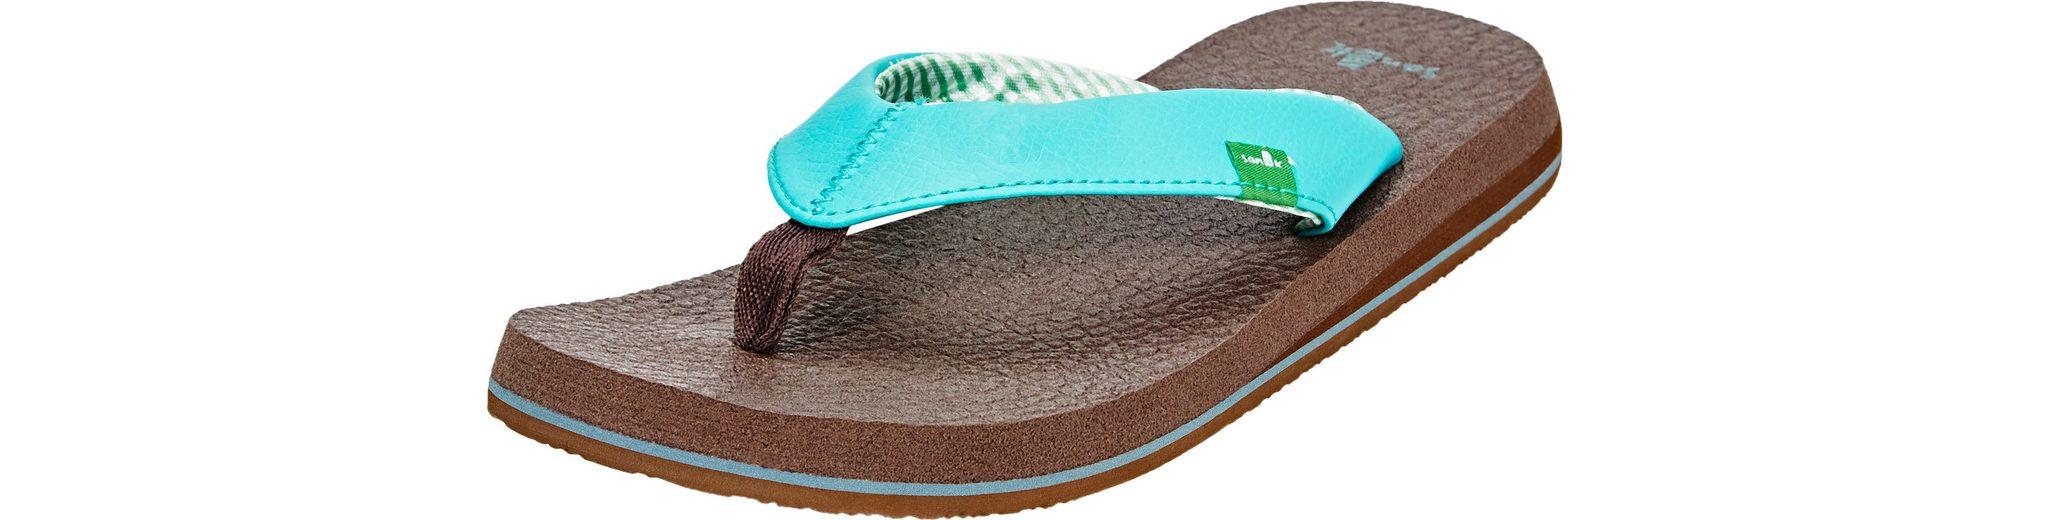 San眉k Sandale Yoga Mat Shoes Women